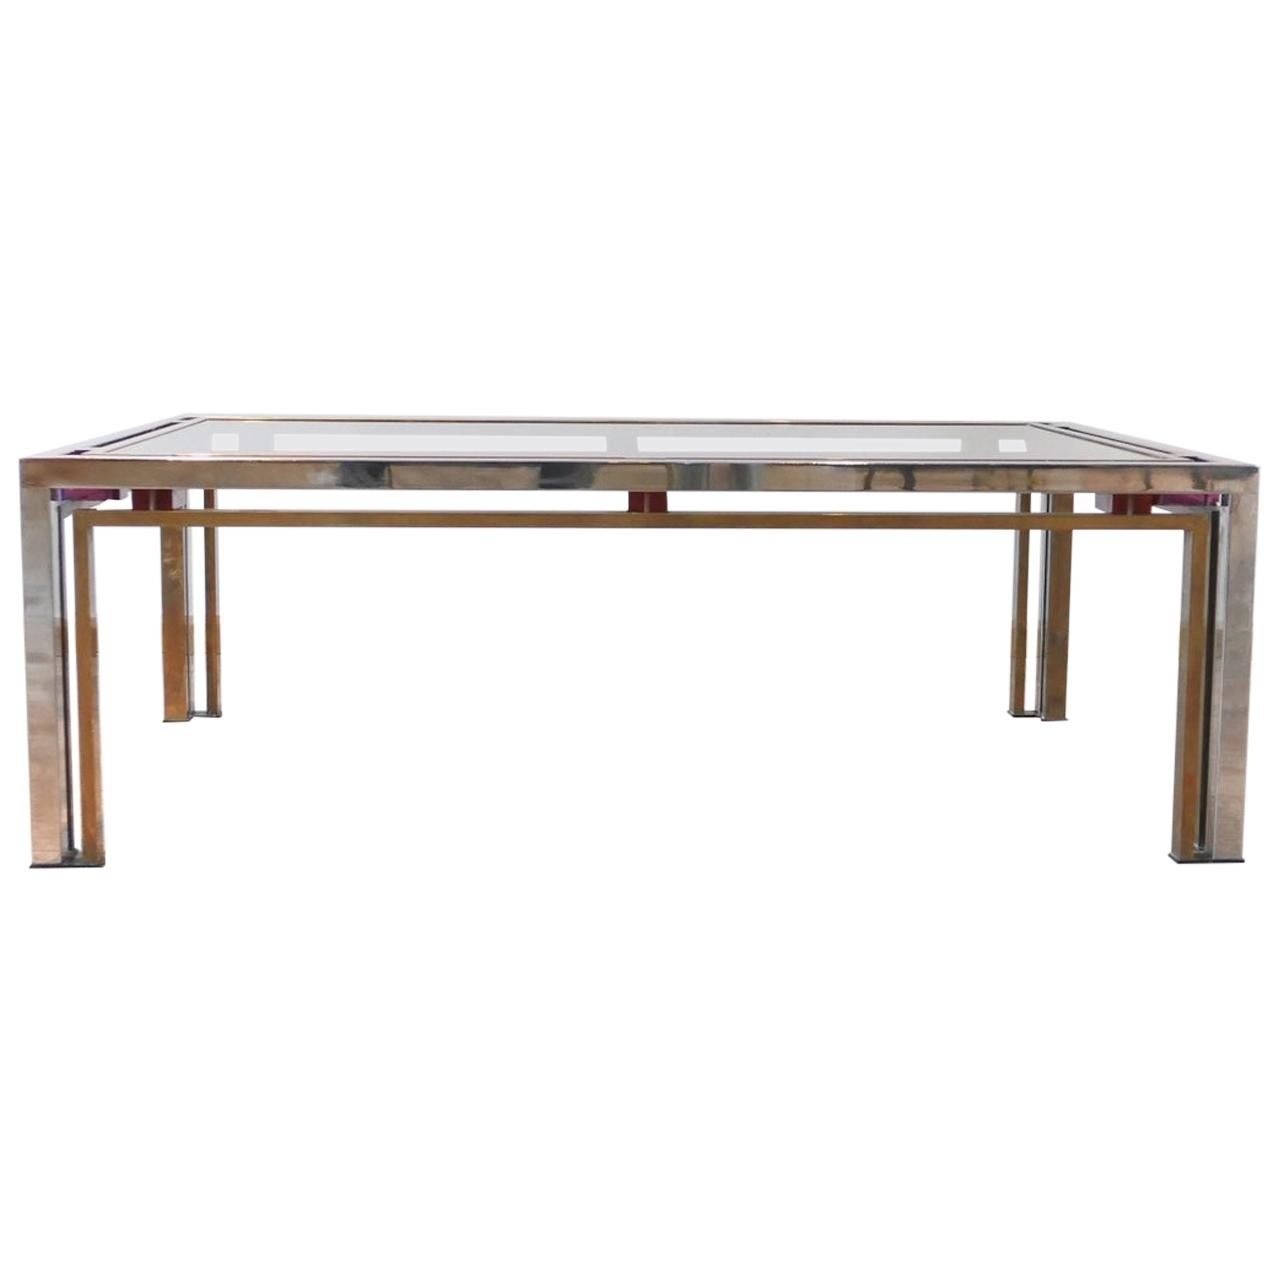 Romeo Rega Hollywood Regency Style Midcentury Coffee Table